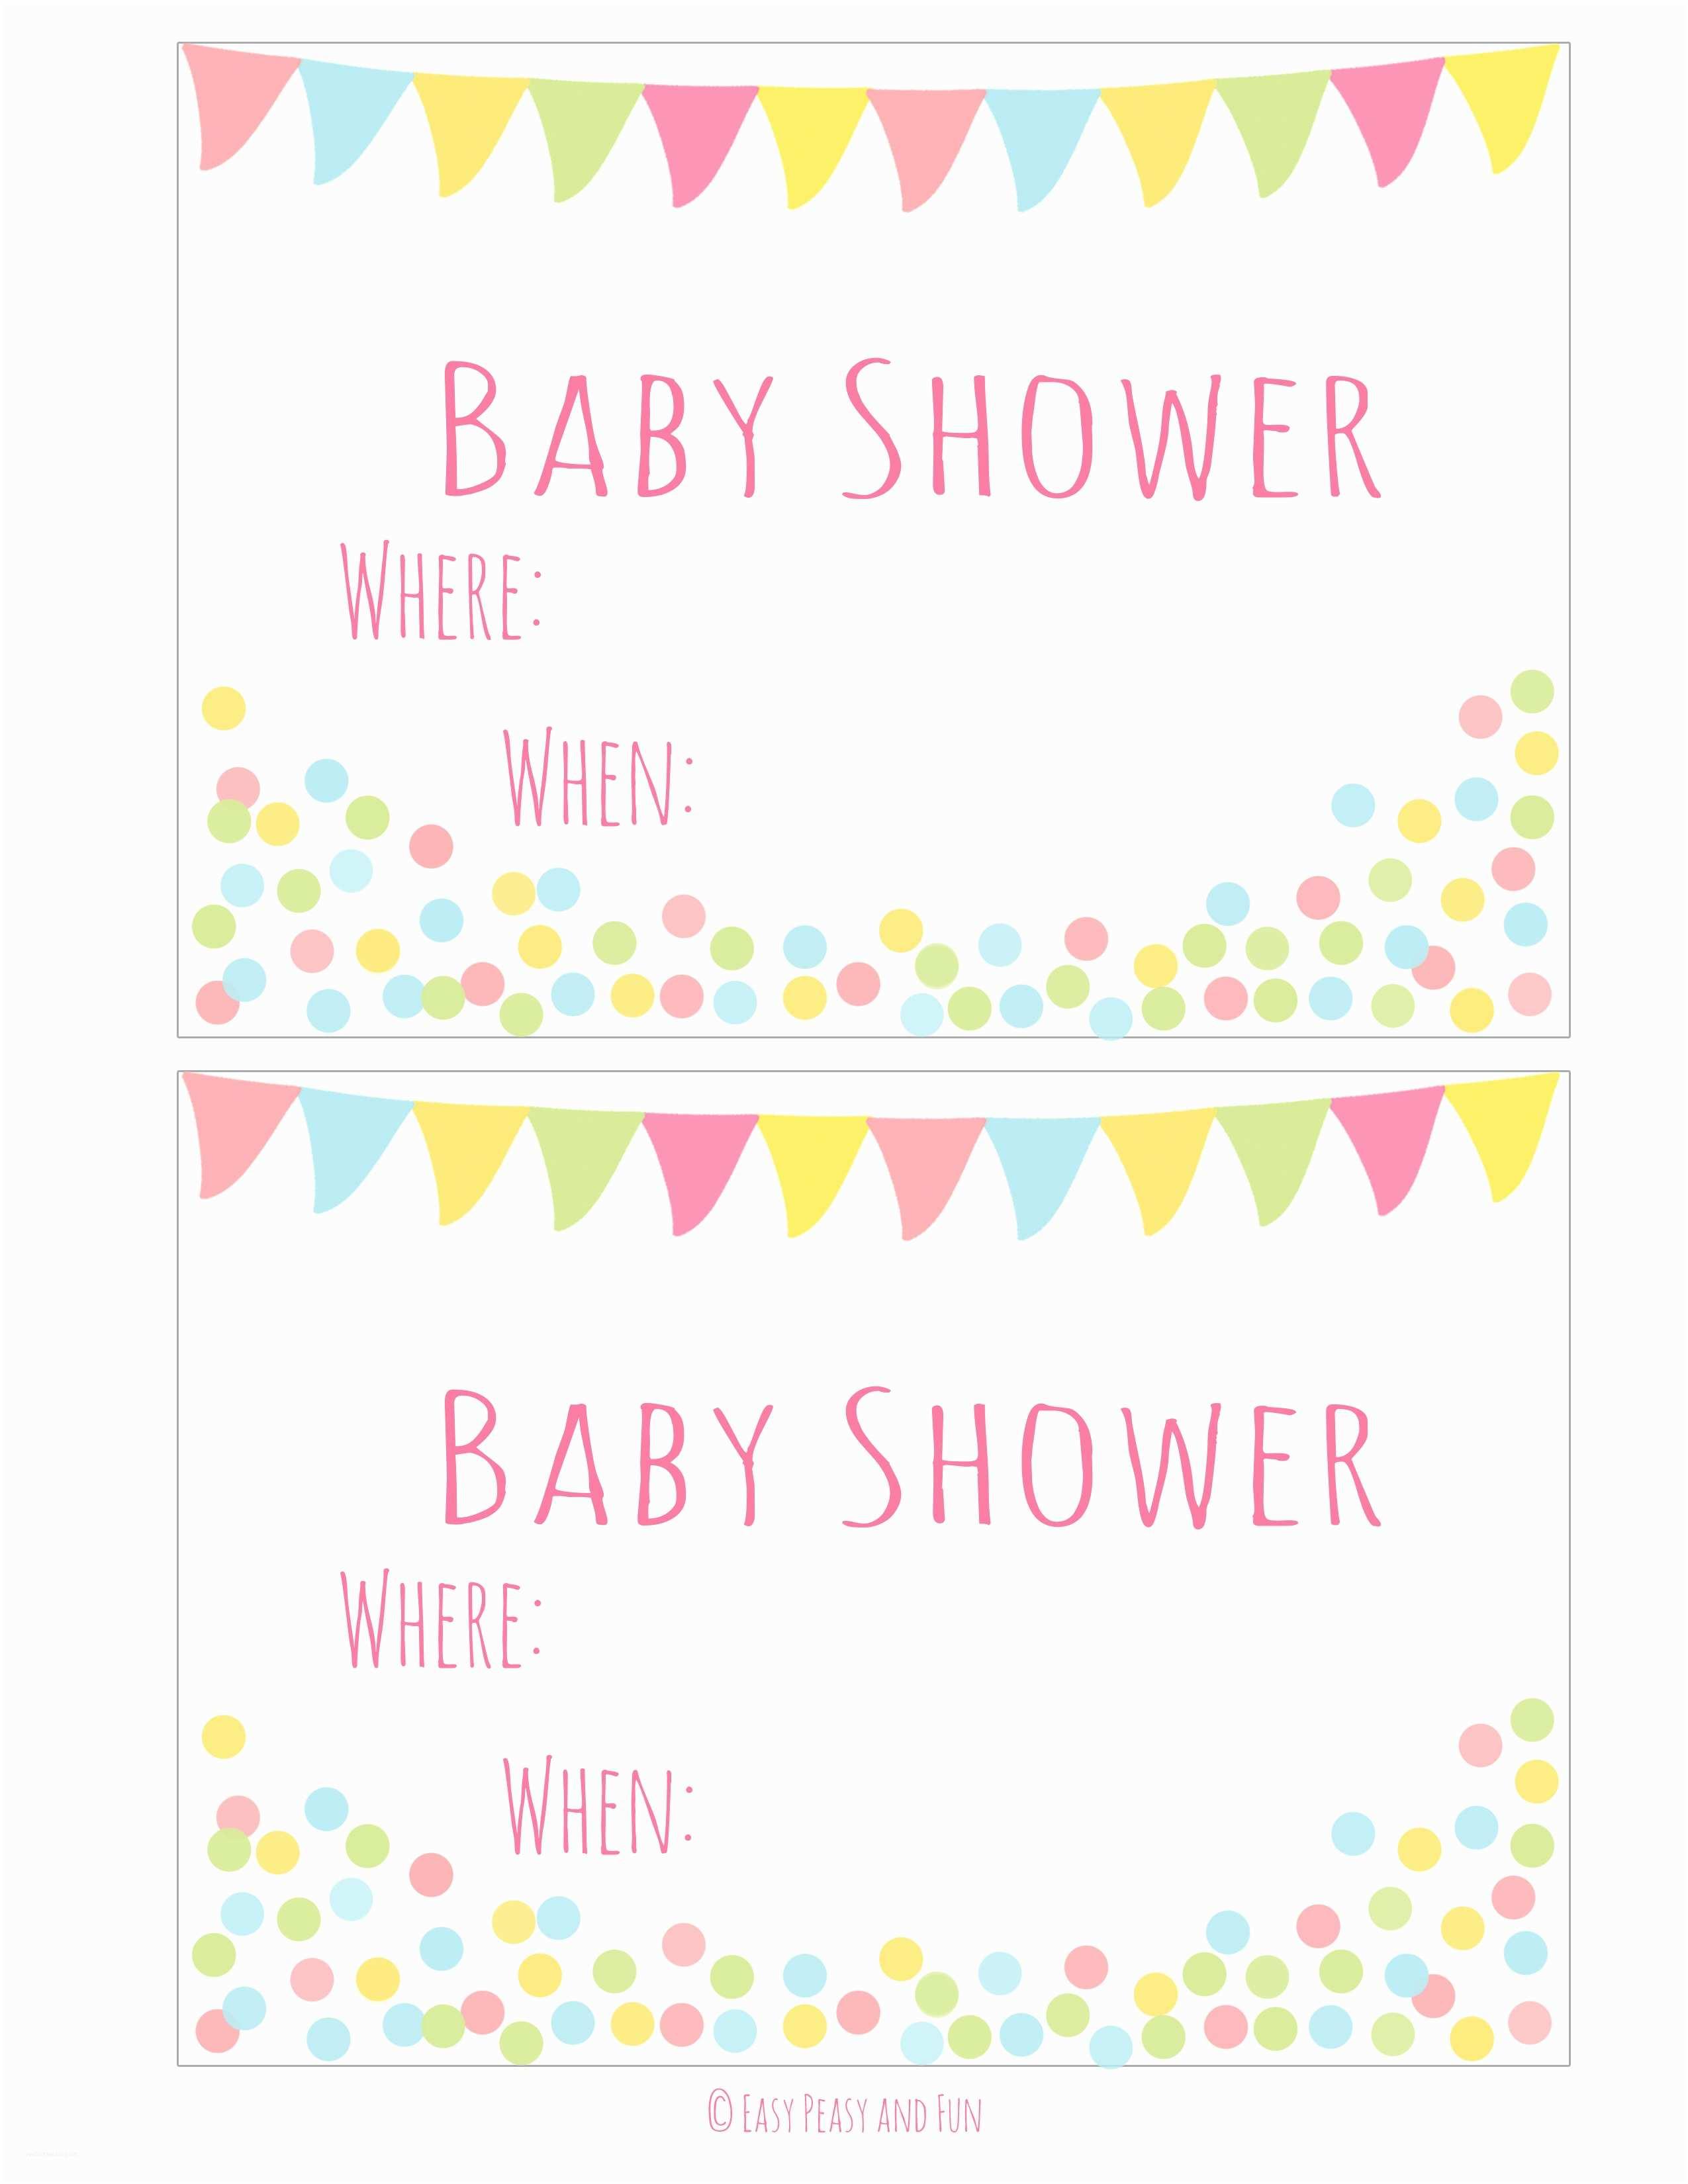 Create Baby Shower Invitations Printable Baby Shower Invitations